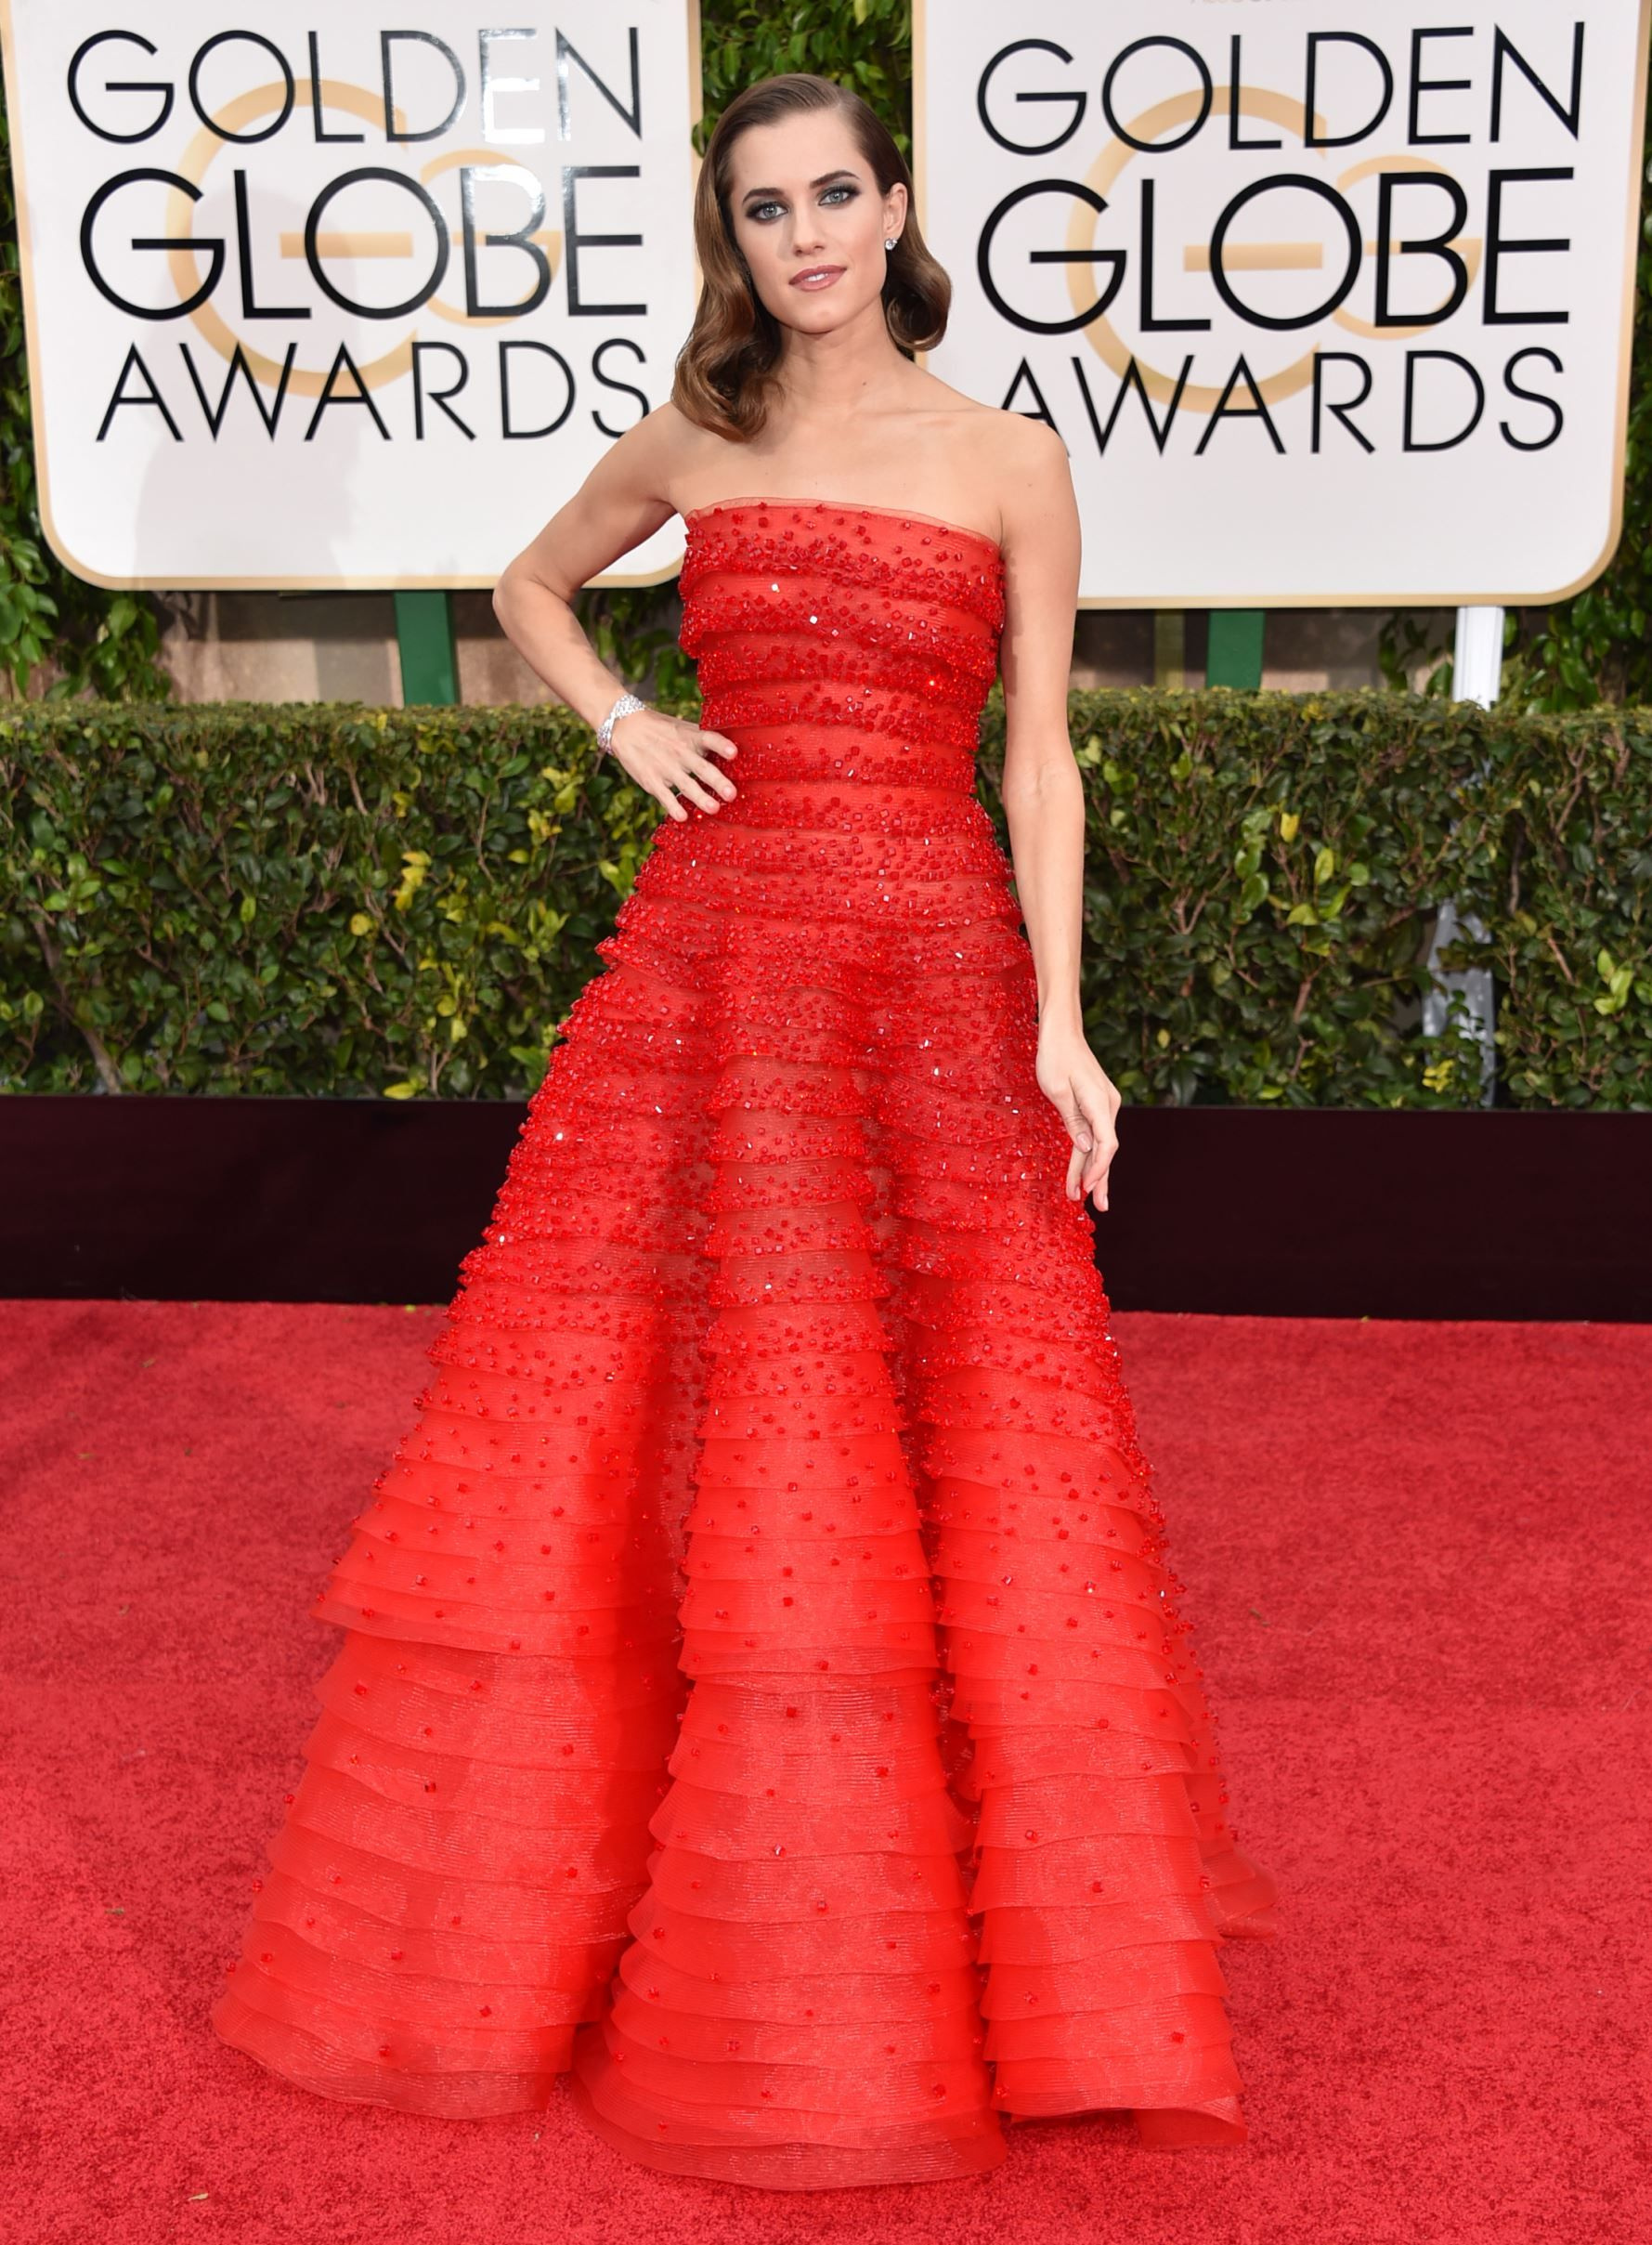 Allison williams wedding dress   Golden Globe Awards  Golden globe award Globe awards and